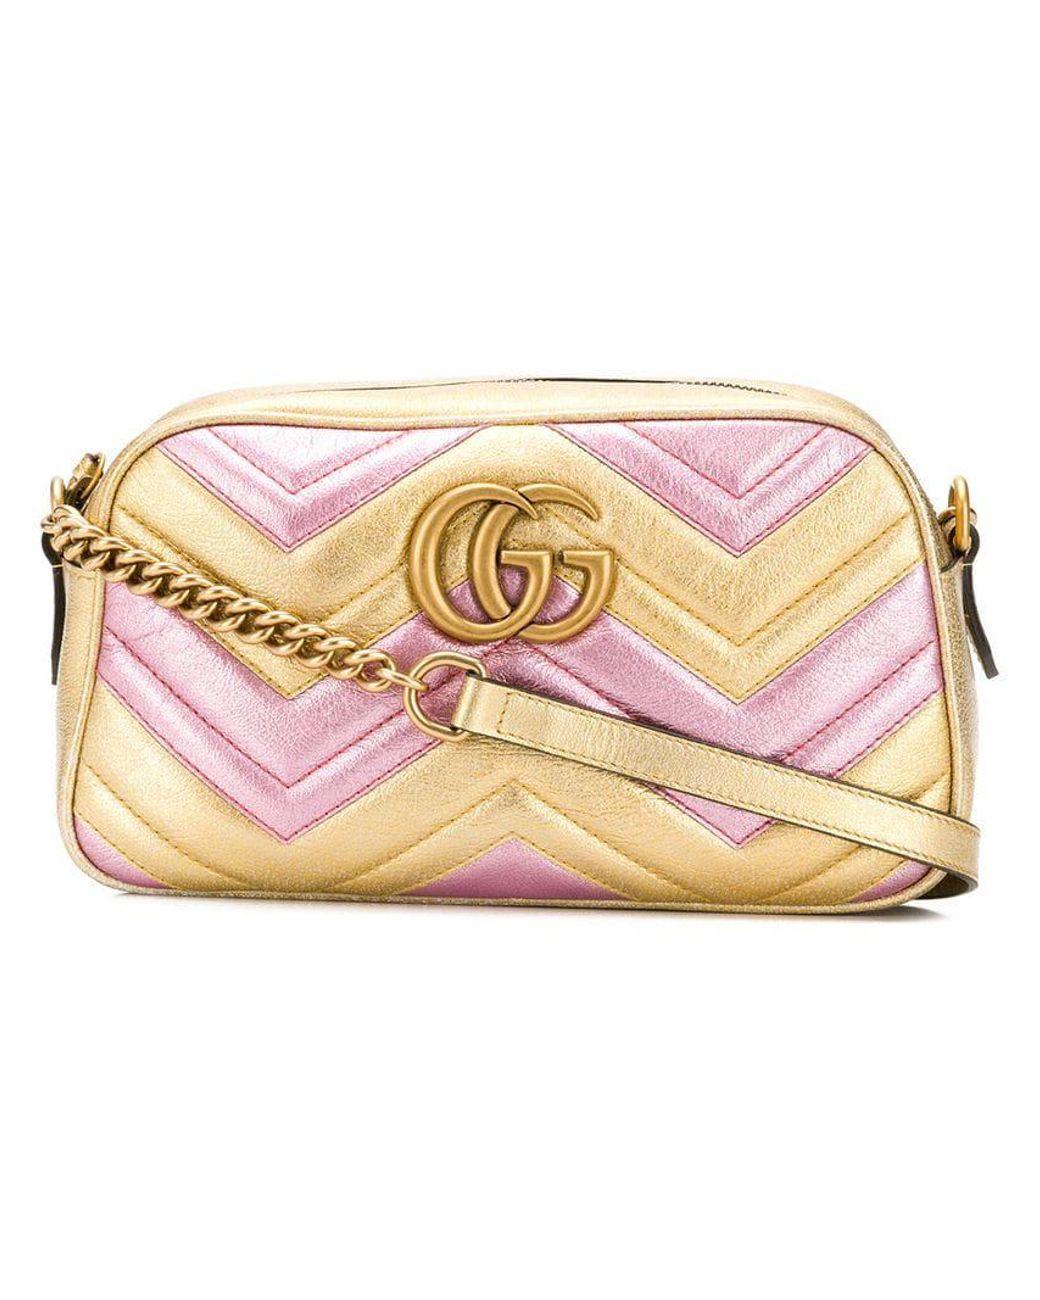 8cac538e86db2b Gucci Laminated GG Marmont Bag in Metallic - Lyst